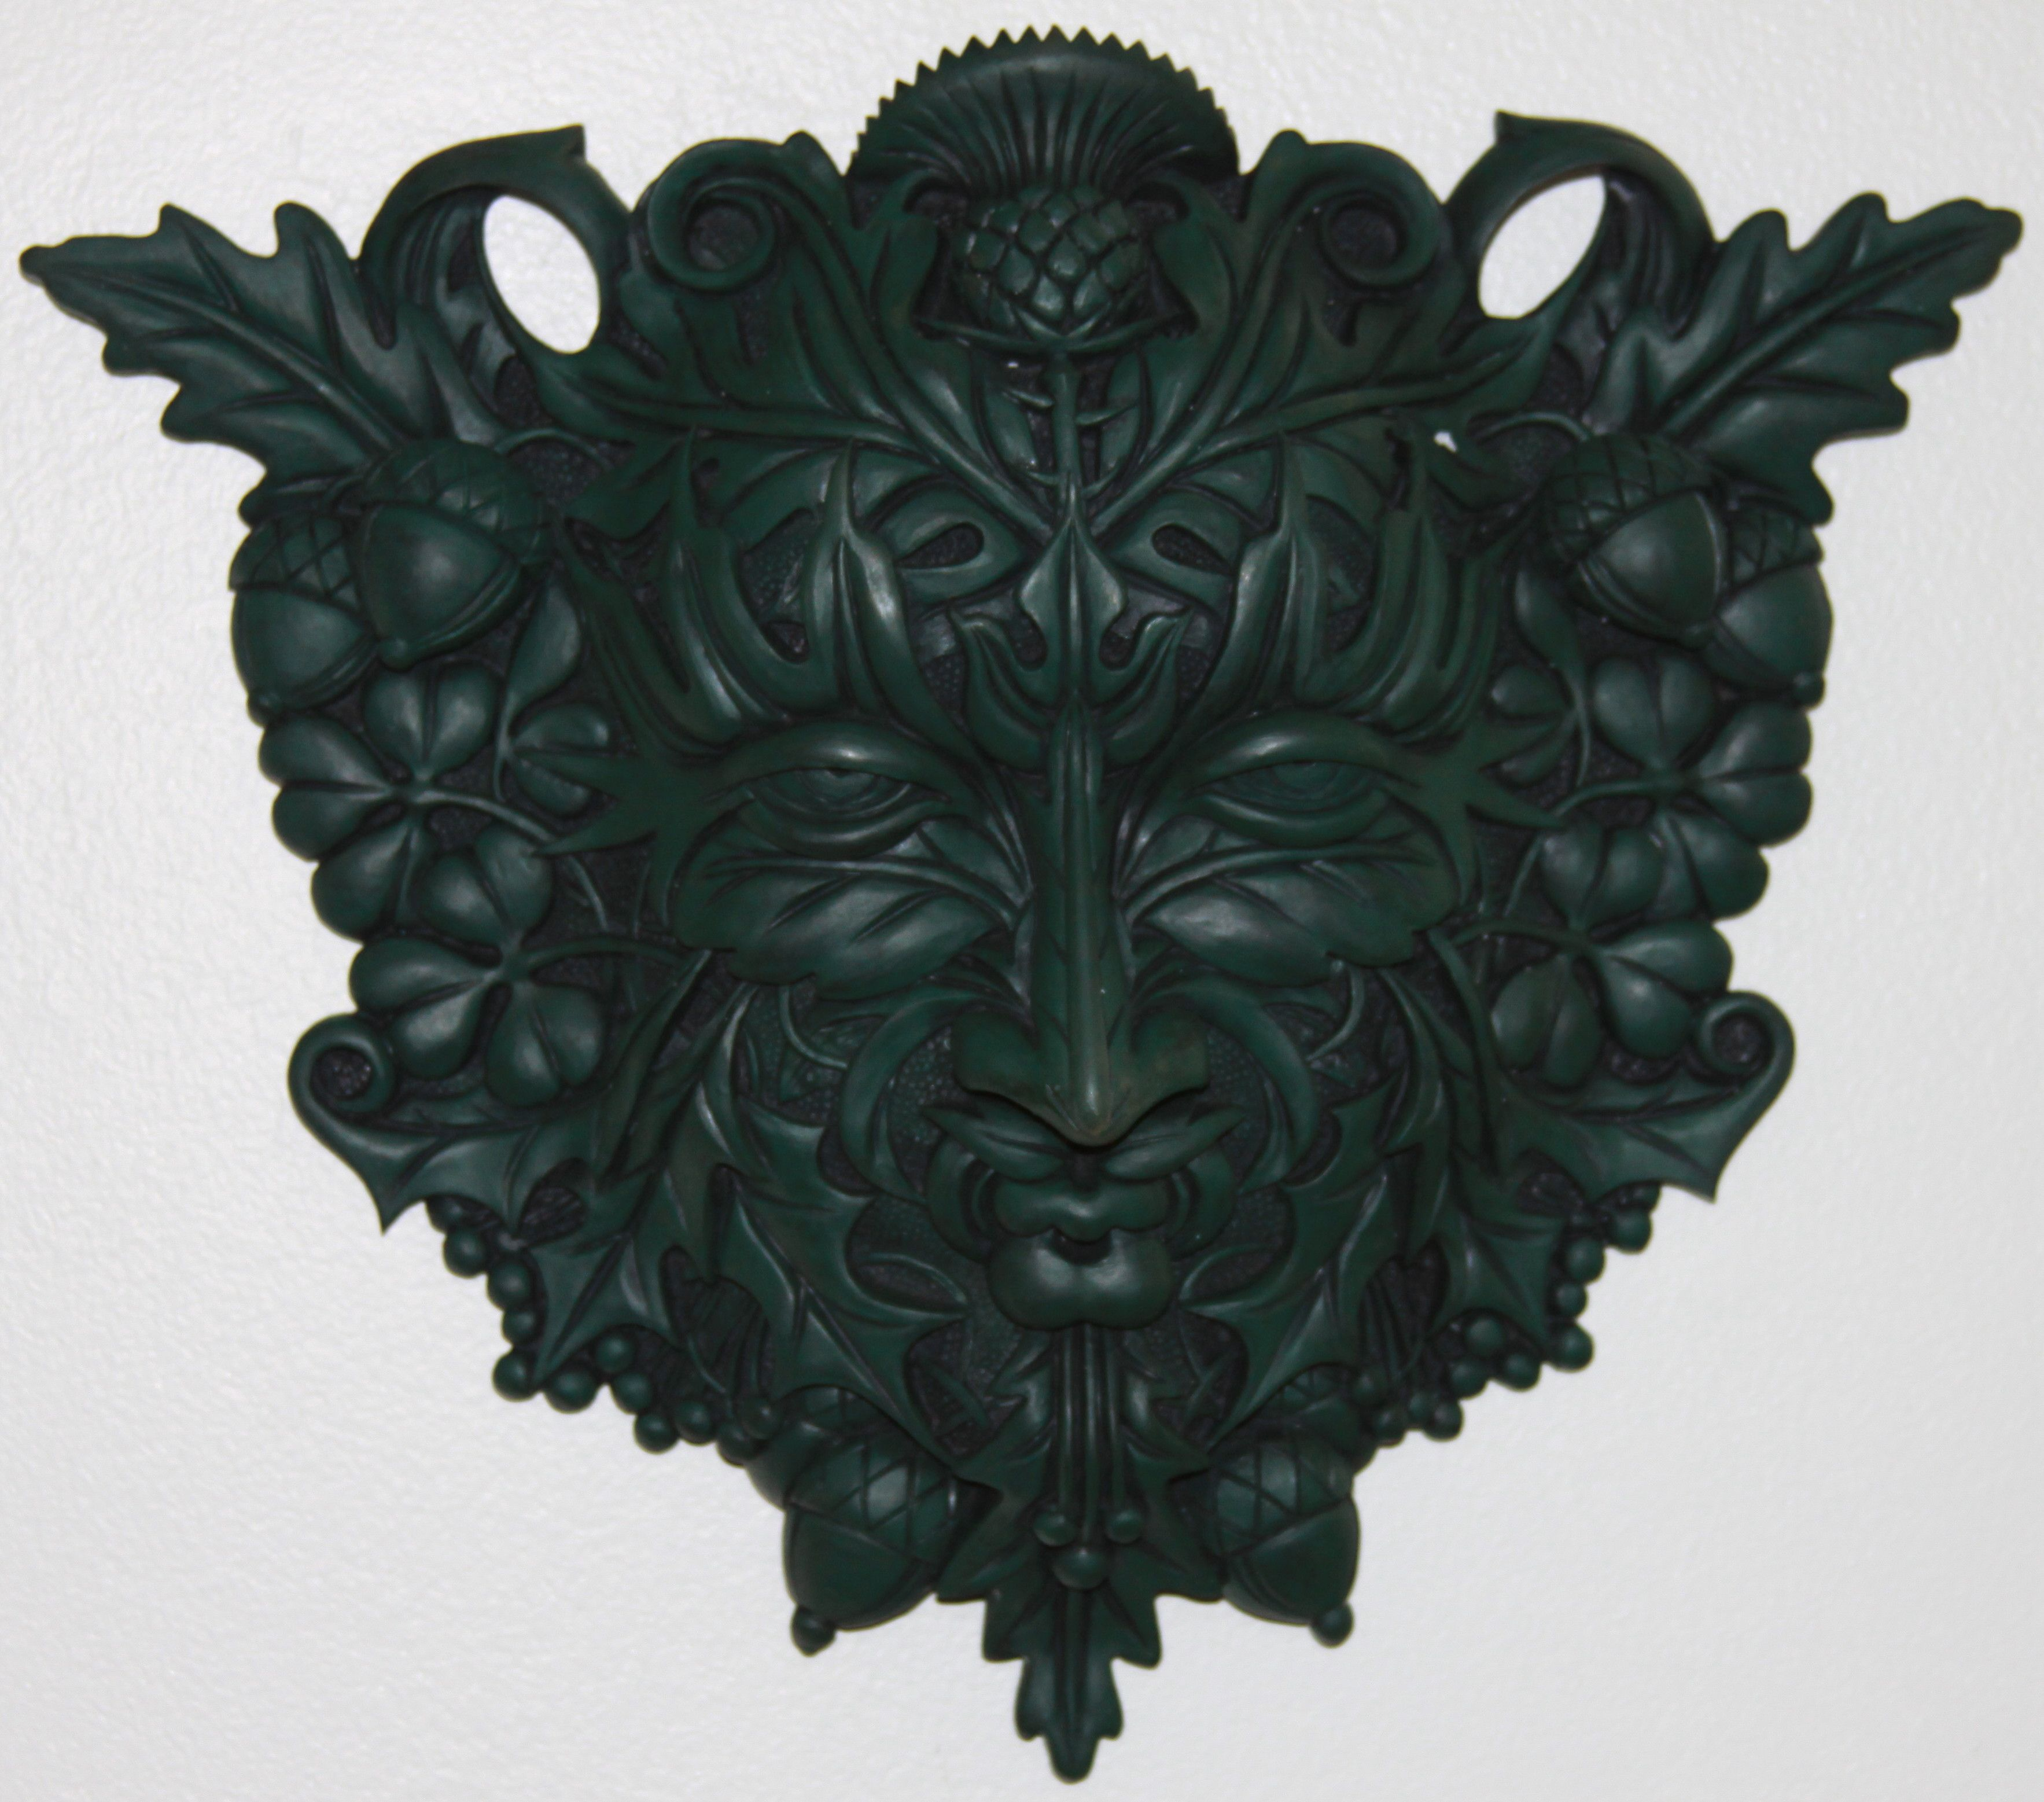 Wallartscottishgreenmang woodcarving pinterest woodcarving